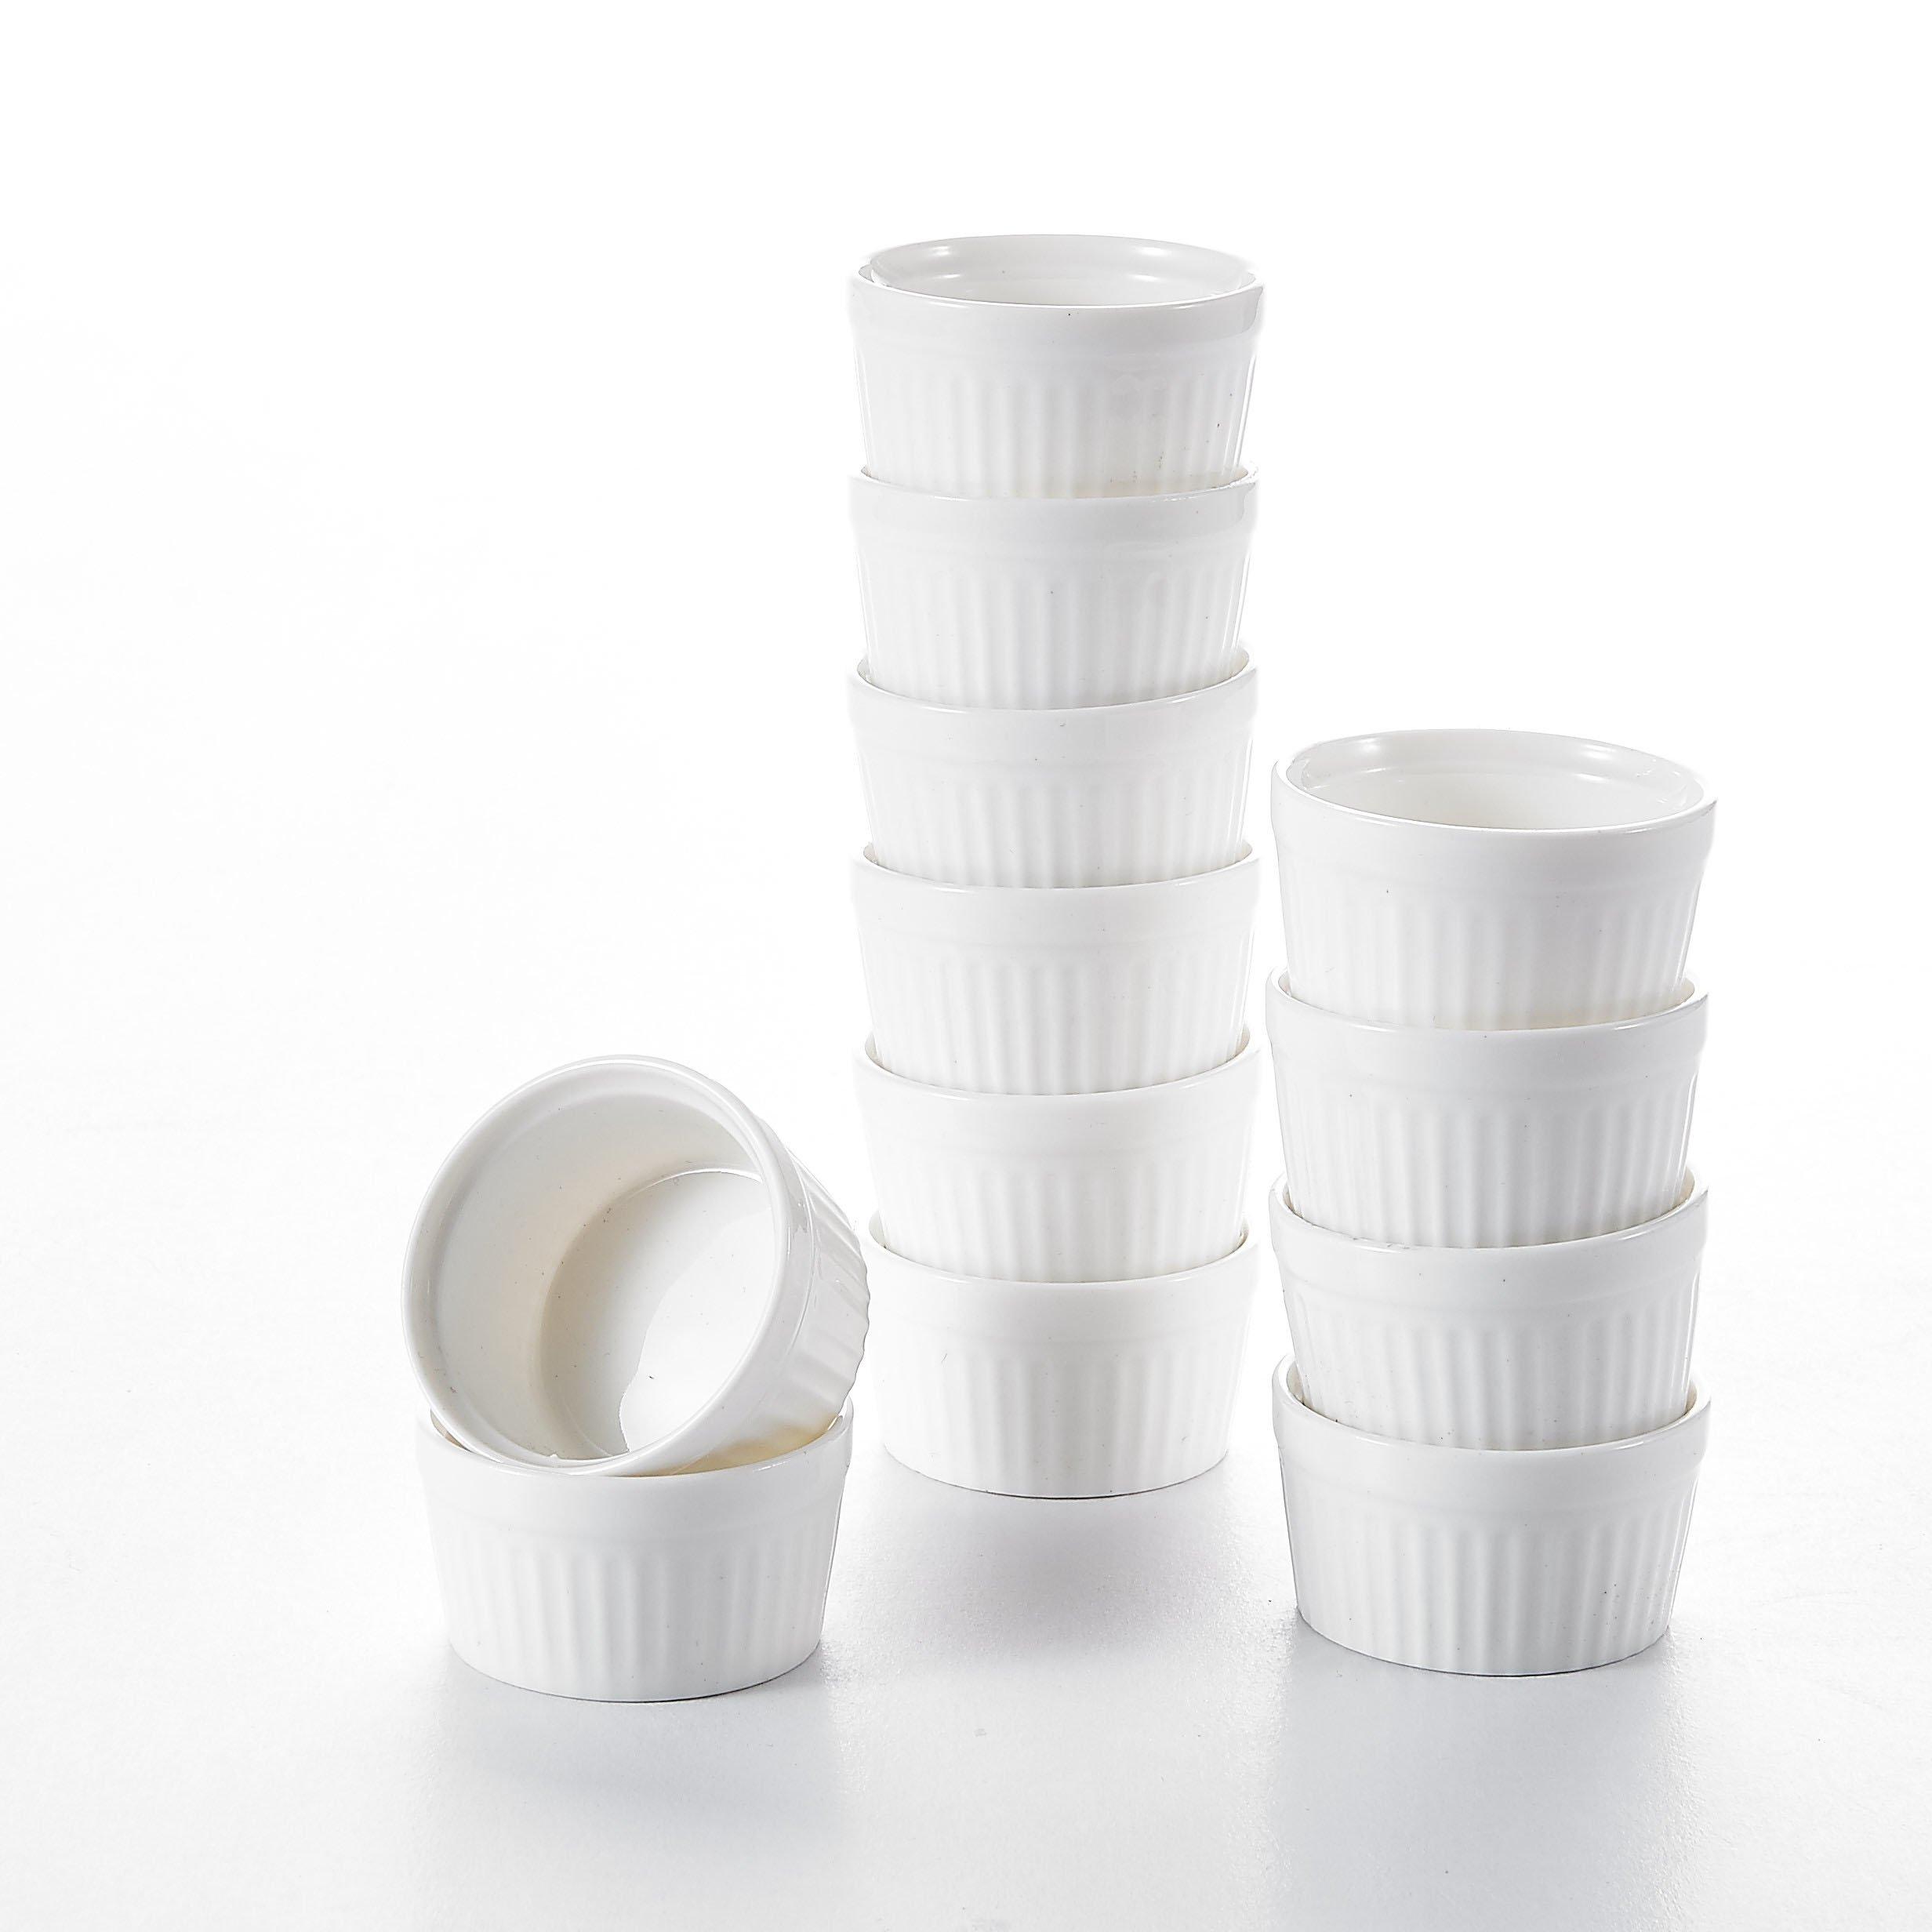 Malacasa 2.4'' Porcelain Ramekins Dipping Bowls, Ivory White 2oz Souffle Baking Dish, Set of 48